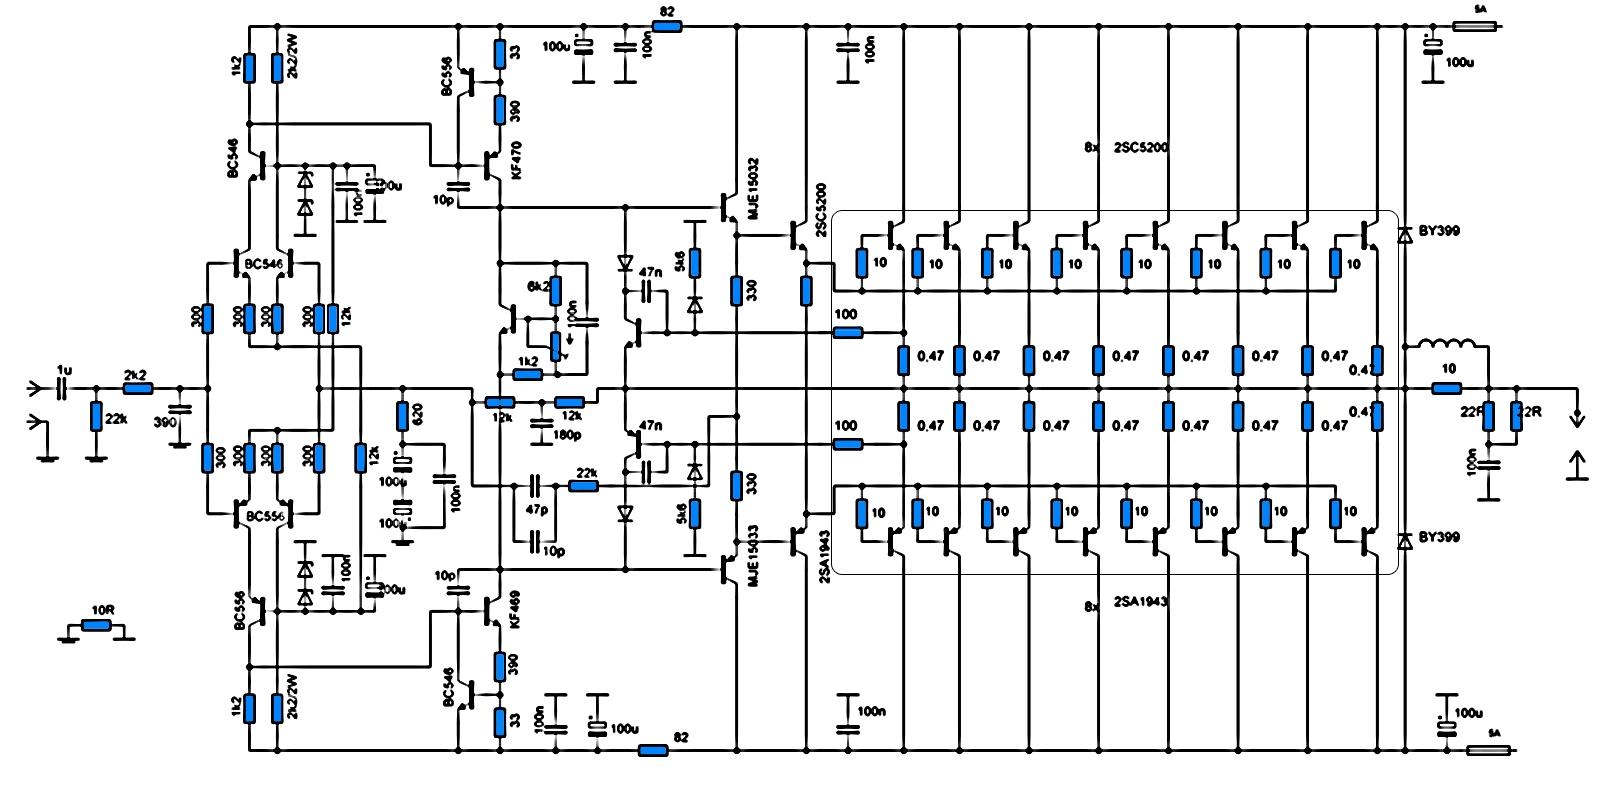 Vt Power Supply Wiring Diagram Wiring Diagram